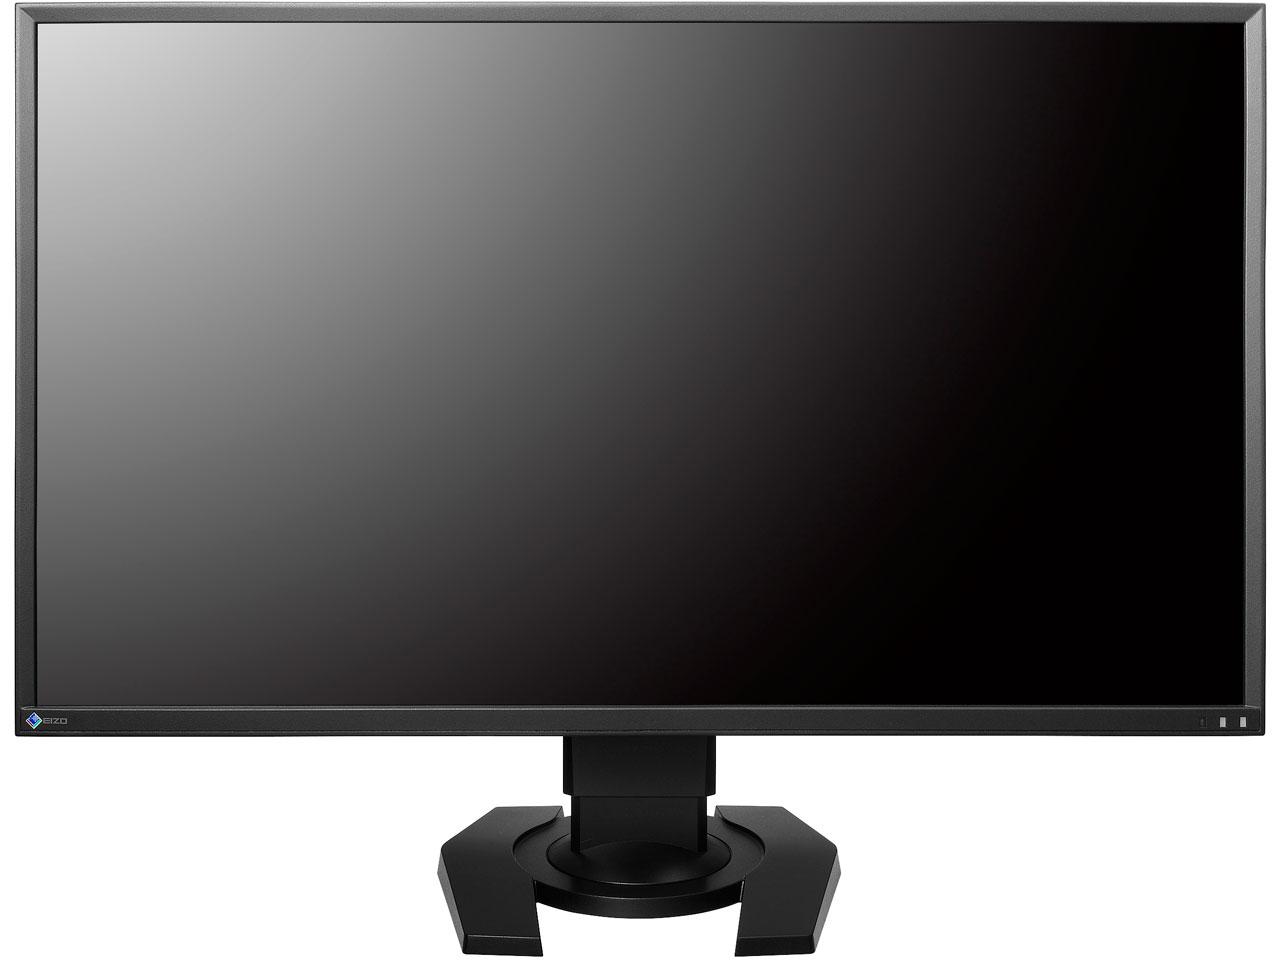 EIZO(ナナオ) FORIS FS2735 [27インチ ブラック] 製品画像